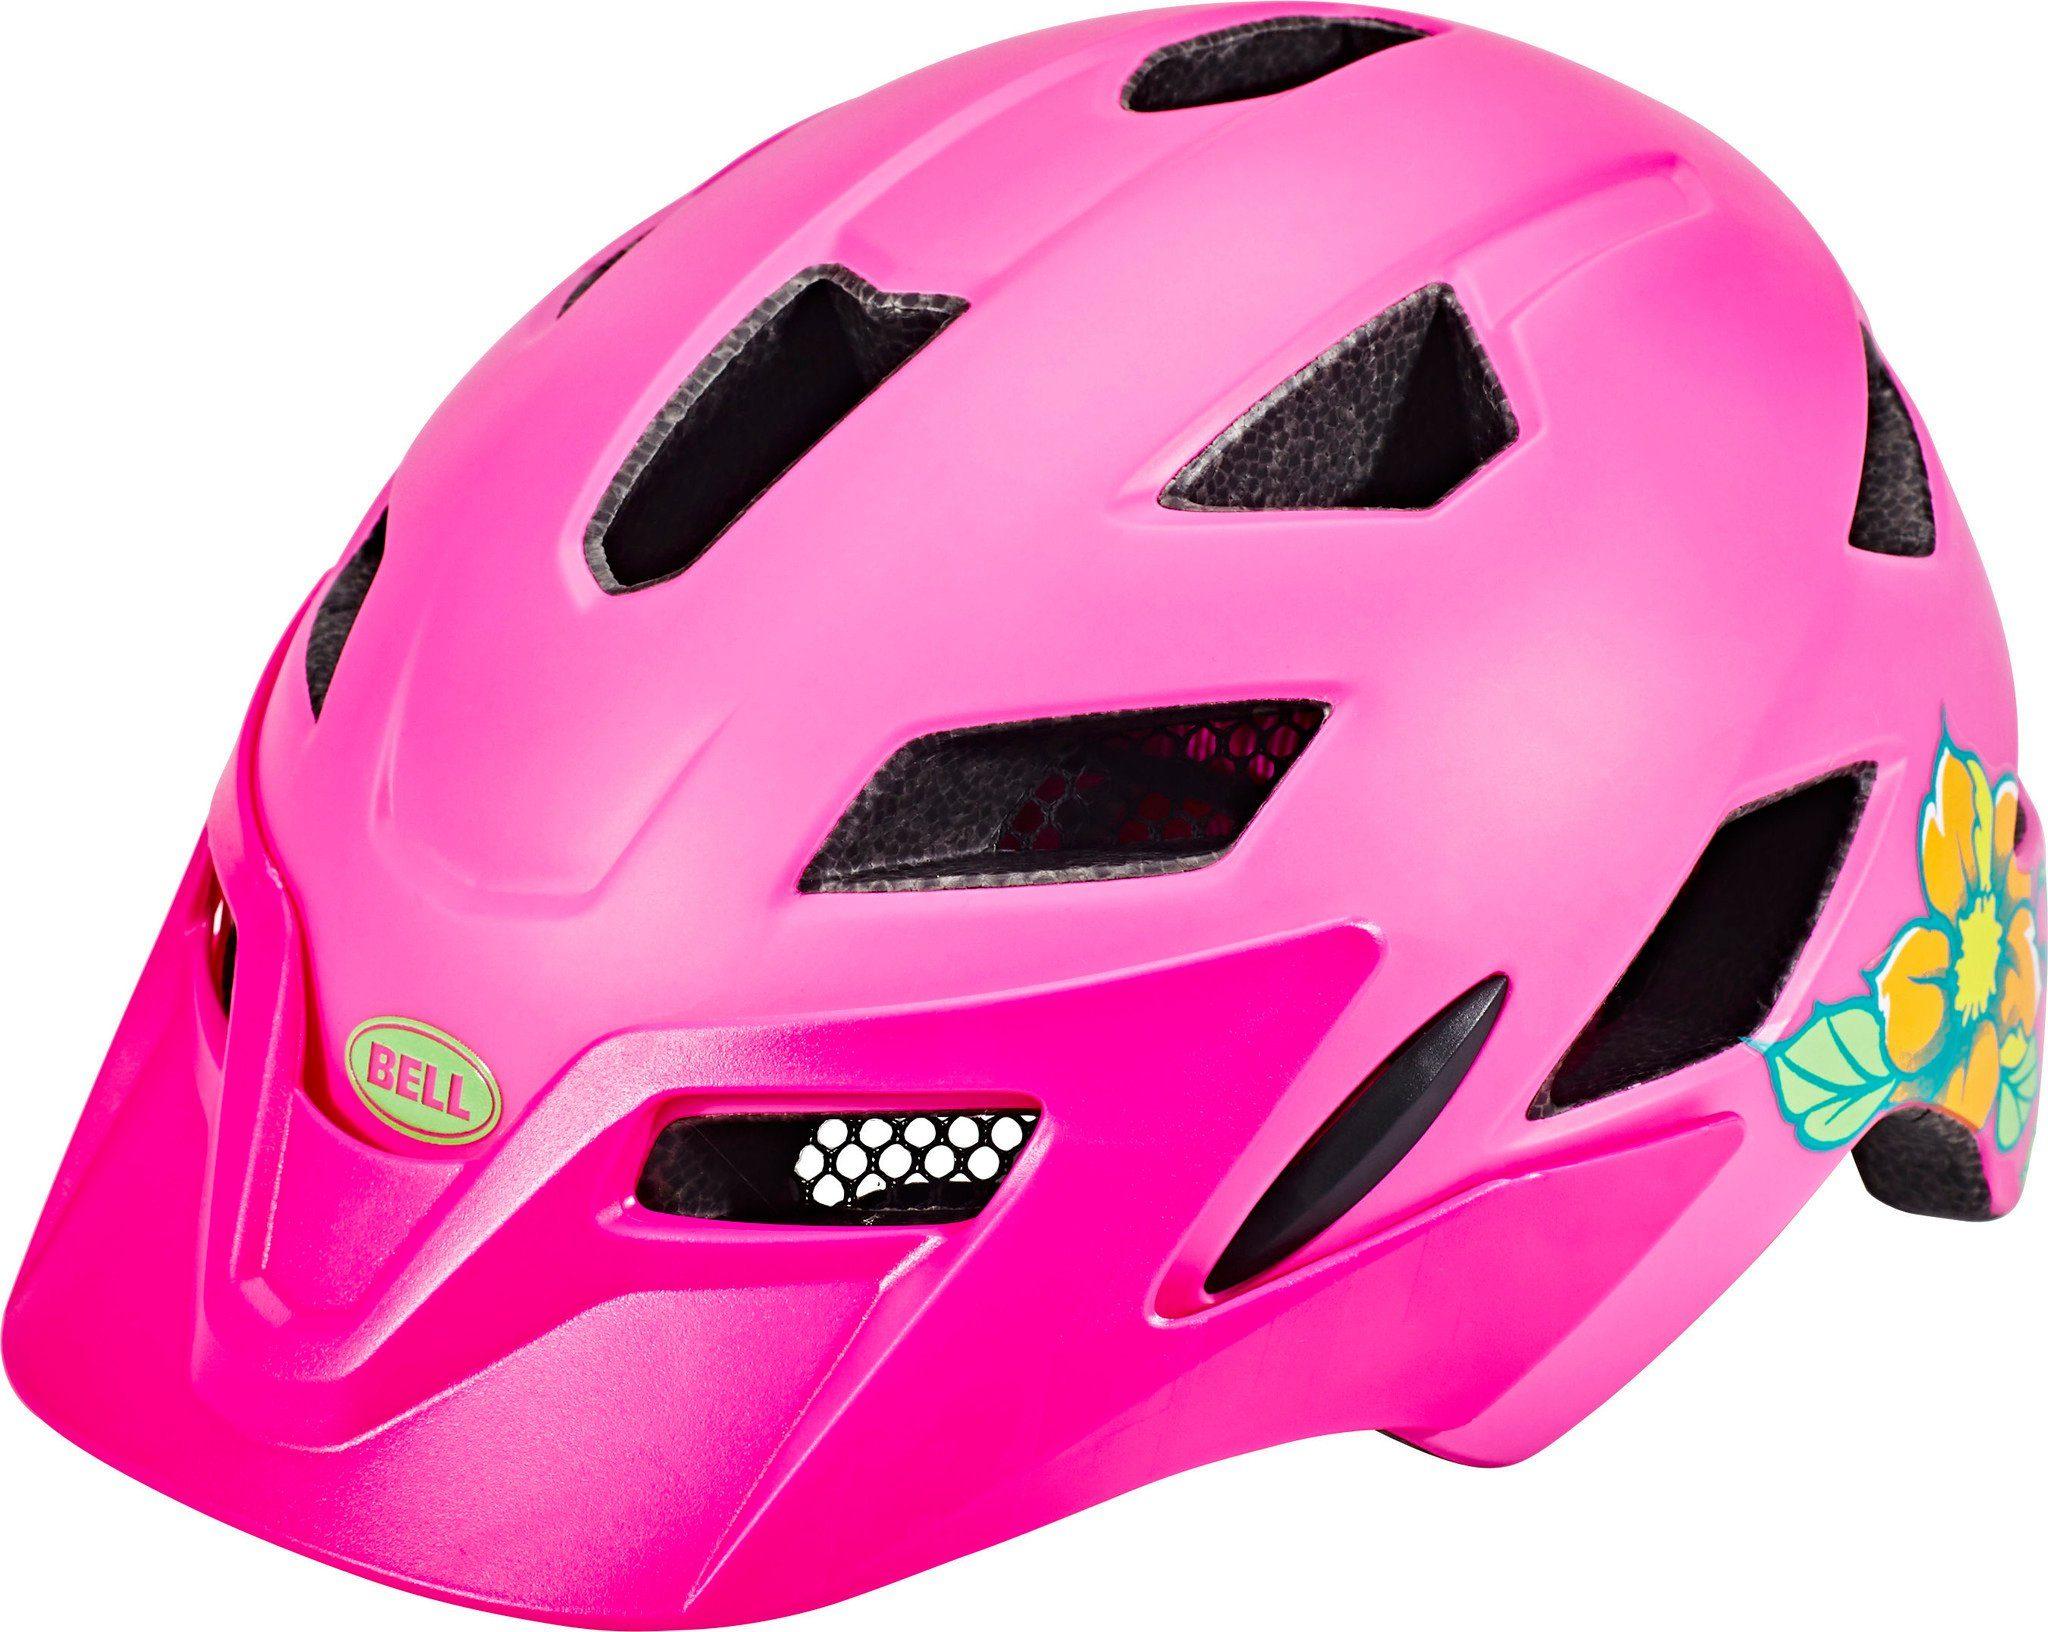 Bell Fahrradhelm »Sidetrack Helmet Youth«